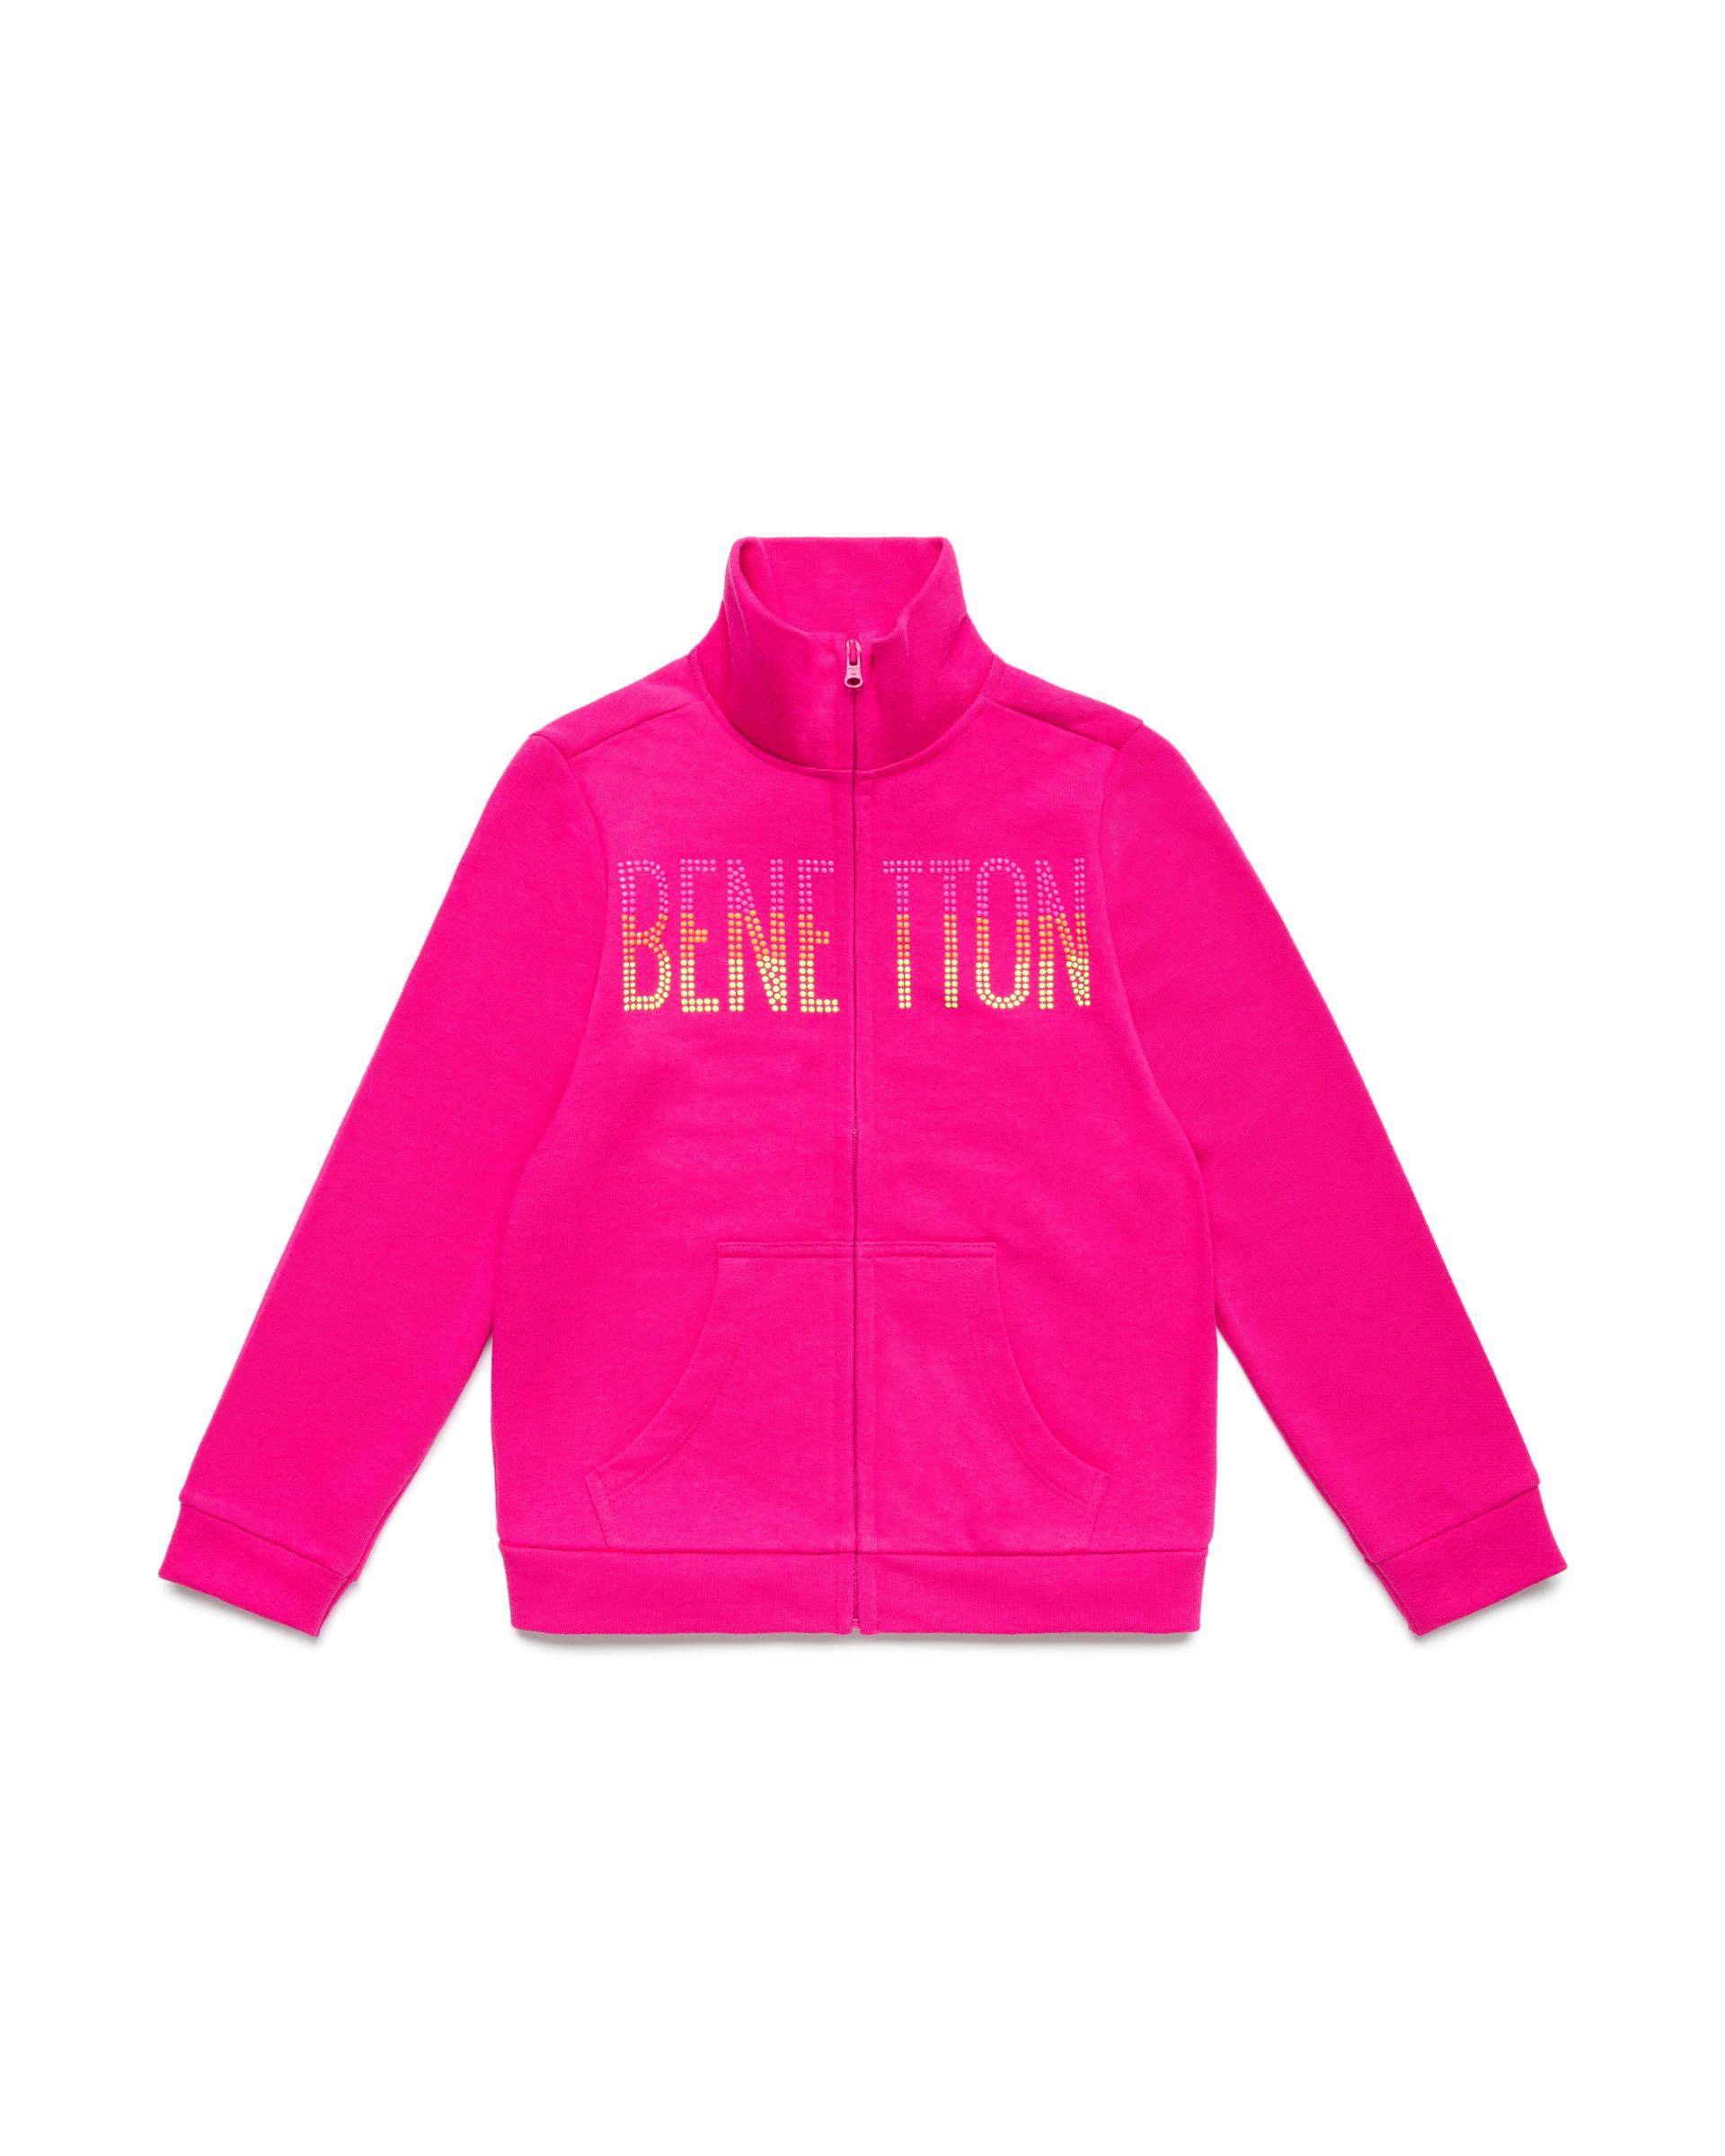 Купить 20P_3J68C5793_2L3, Толстовка для девочек Benetton 3J68C5793_2L3 р-р 152, United Colors of Benetton, Толстовки для девочек